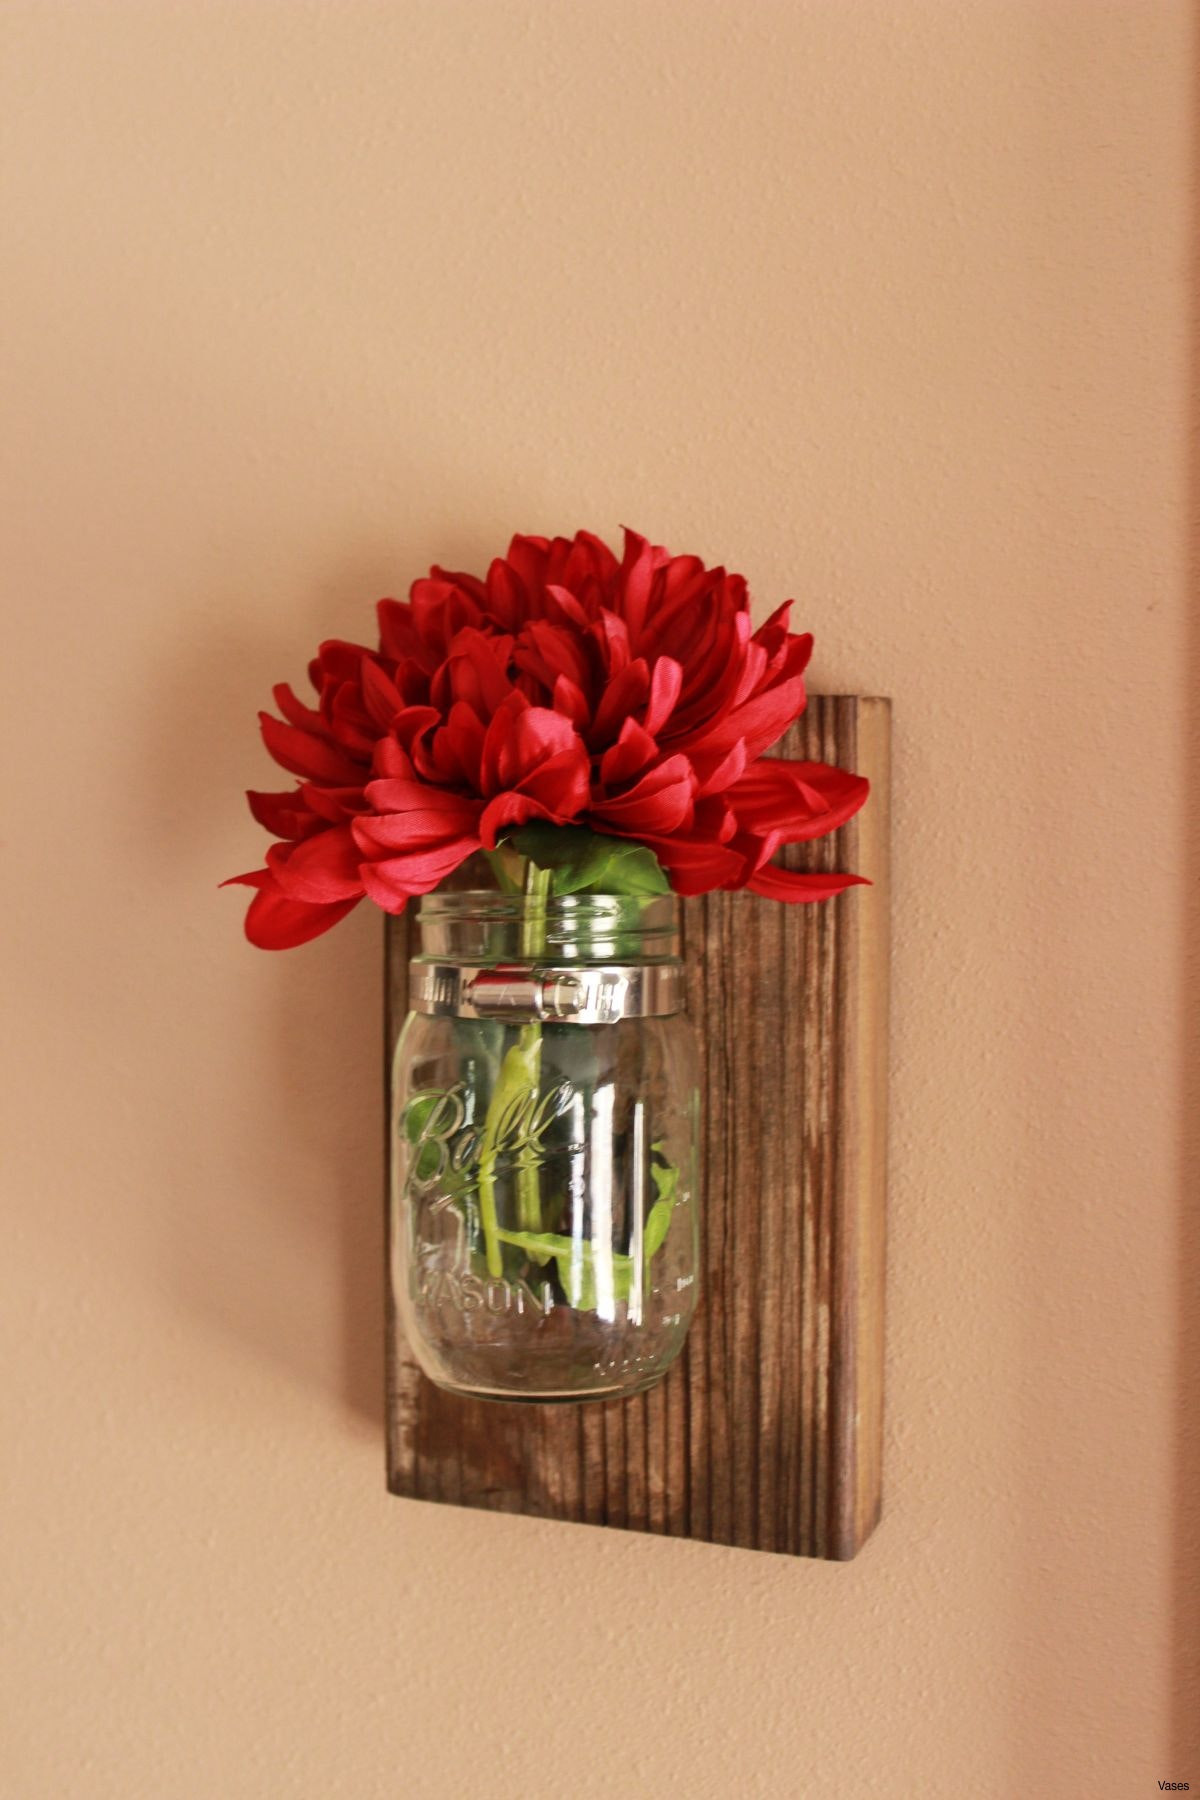 target vase filler of red decorative vases images il fullxfull nny9h vases flower vase within il fullxfull nny9h vases flower vase sconces zoomi 0d wall design